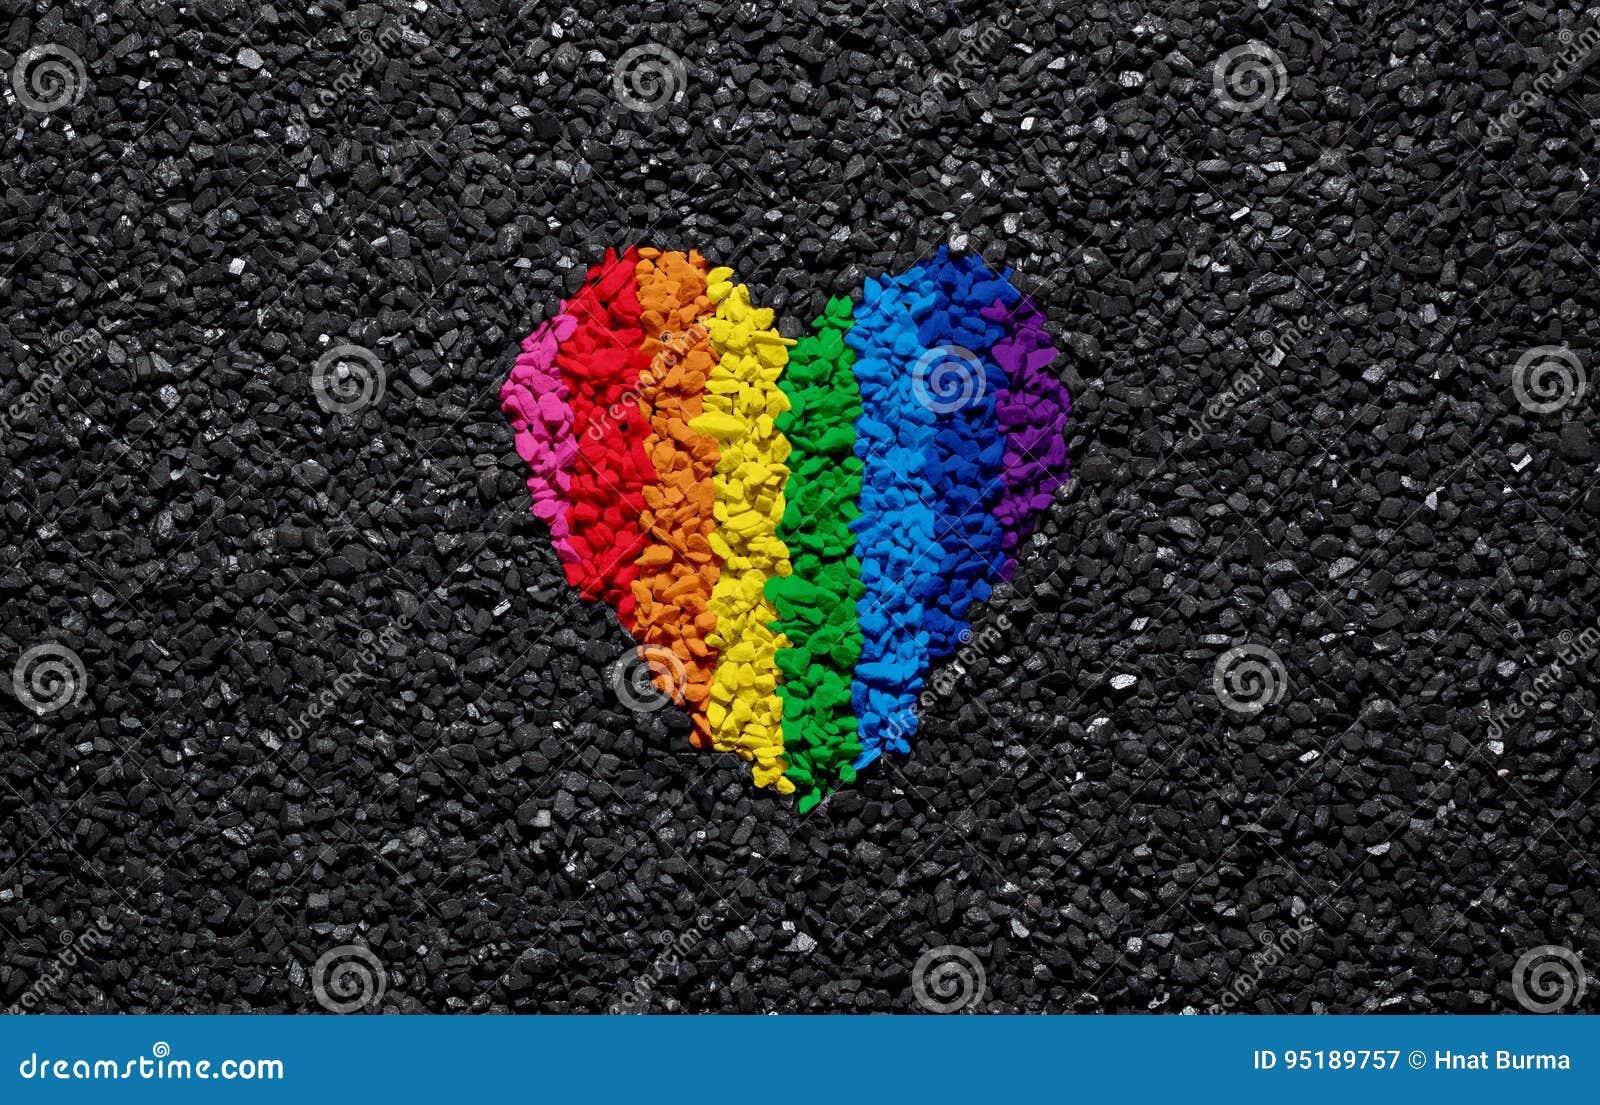 Rainbow heart on black background, gravel and shingle, LGBT colors, love wallpaper, valentine